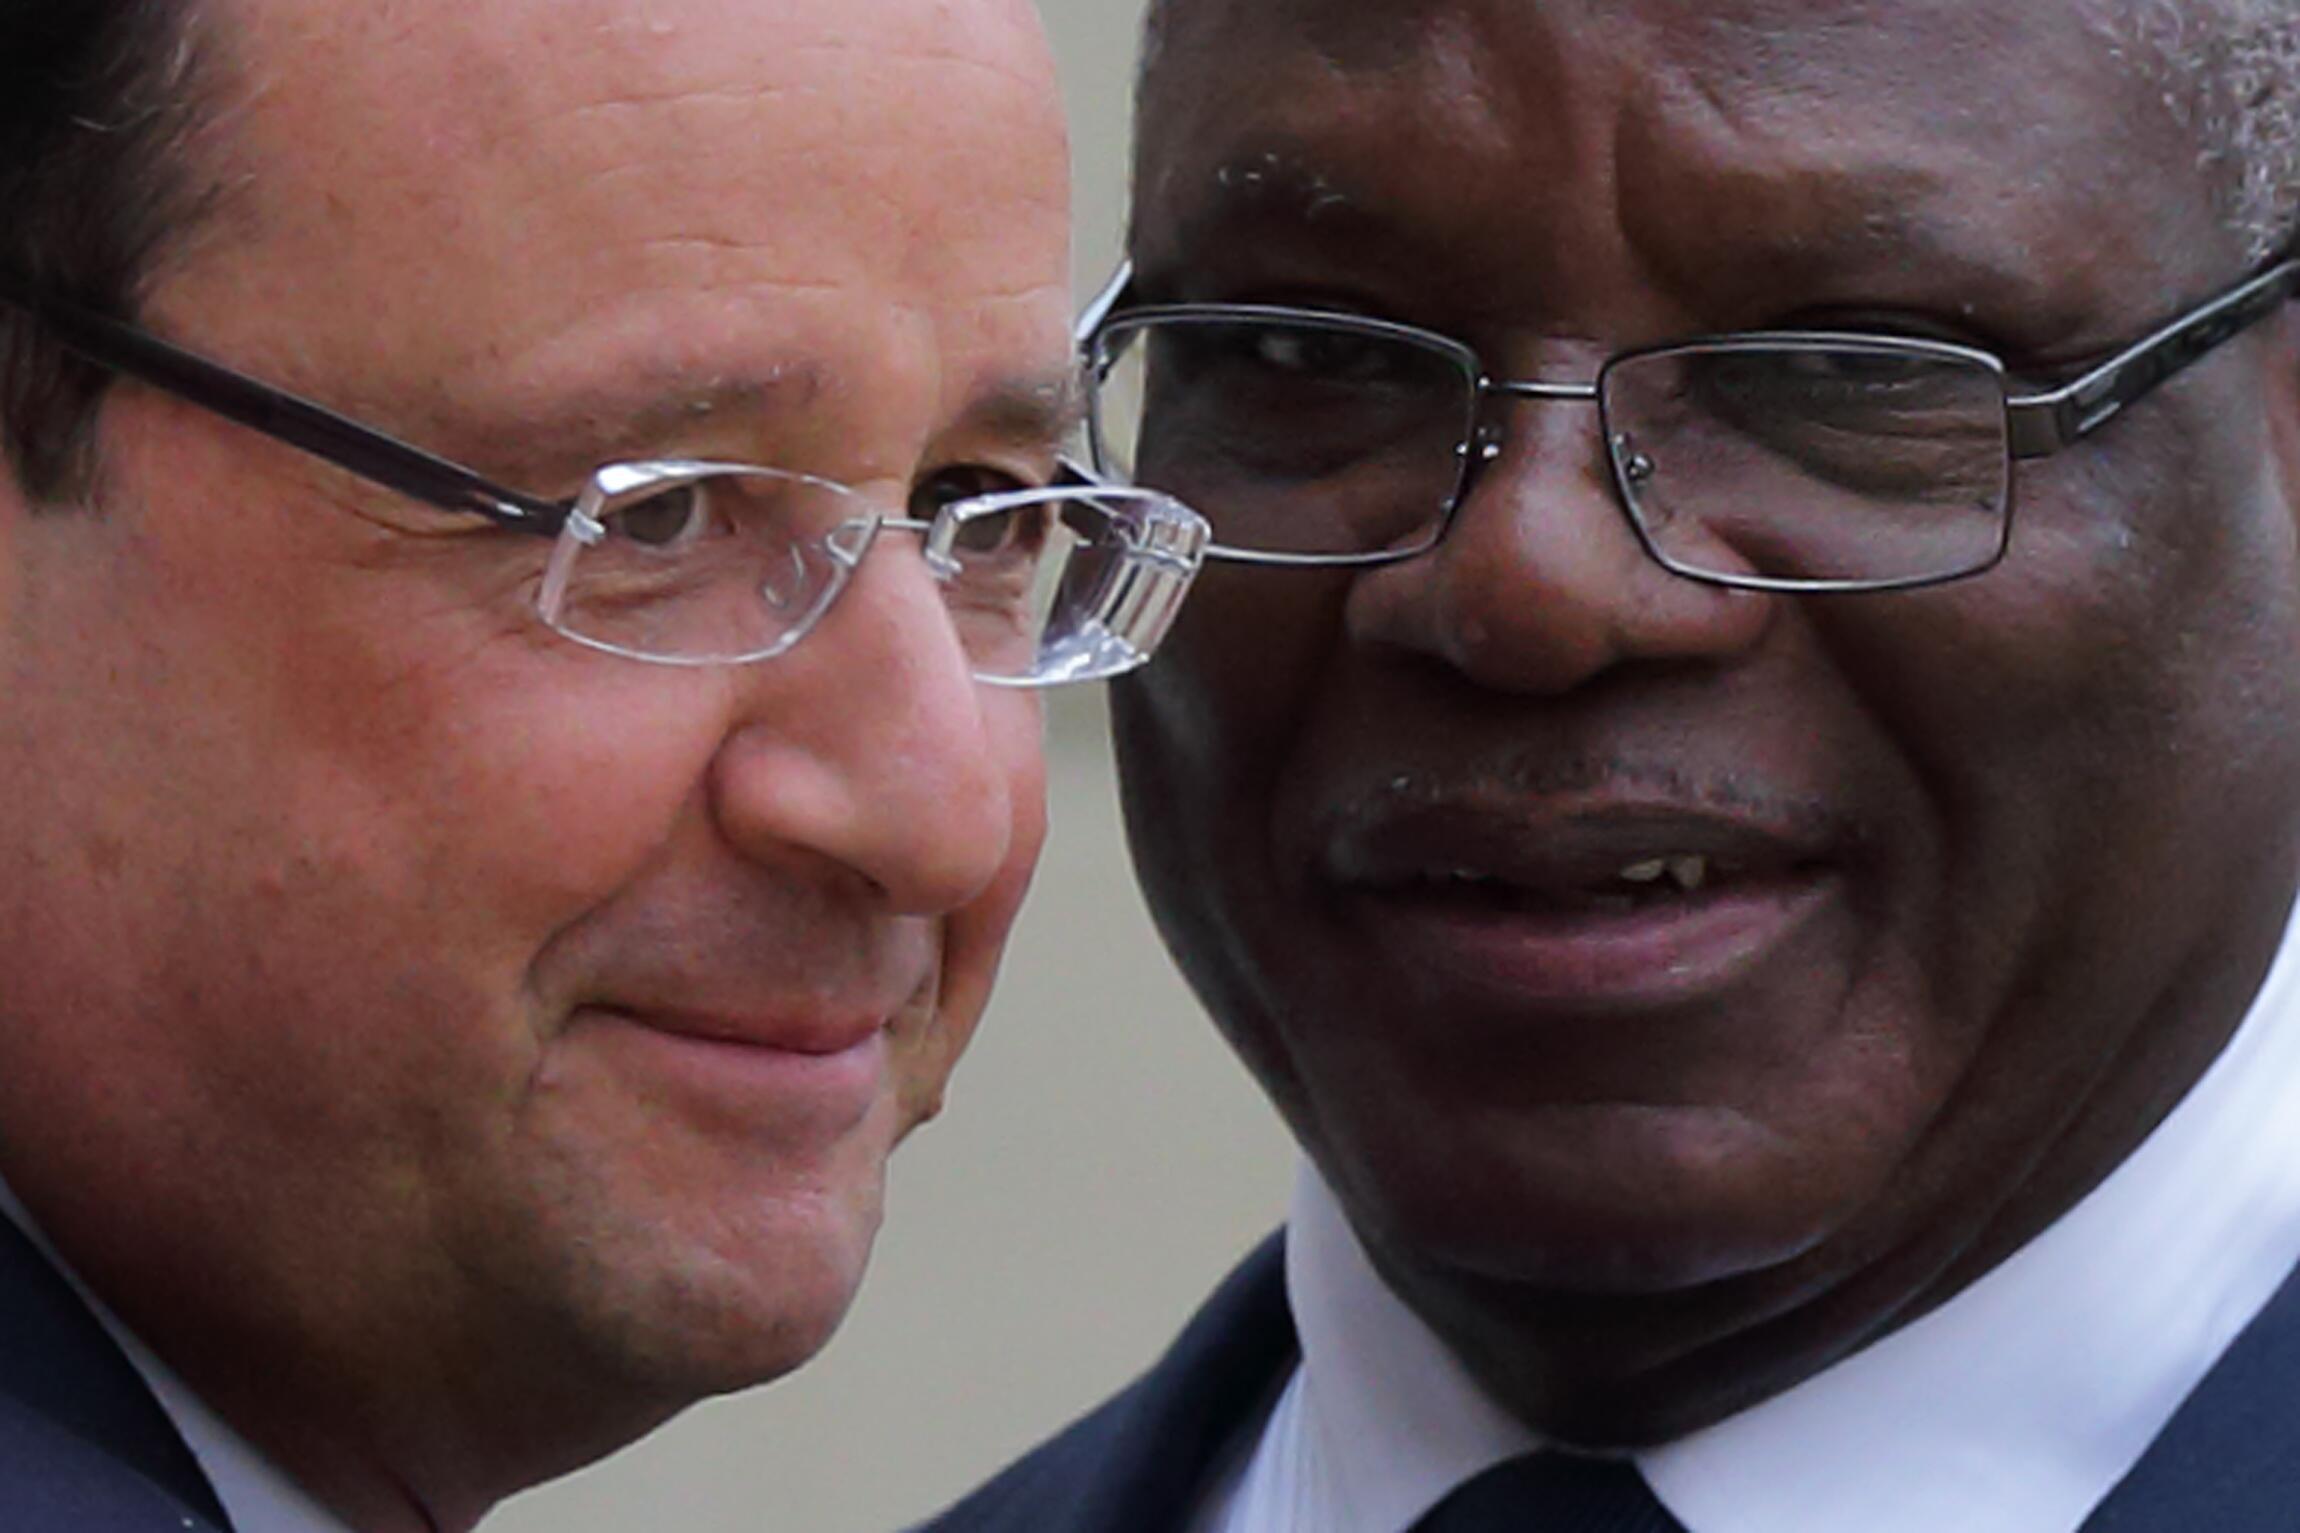 French President François Holland with Mali's Ibrahim Boubacar Keïta at the Elysée Palace